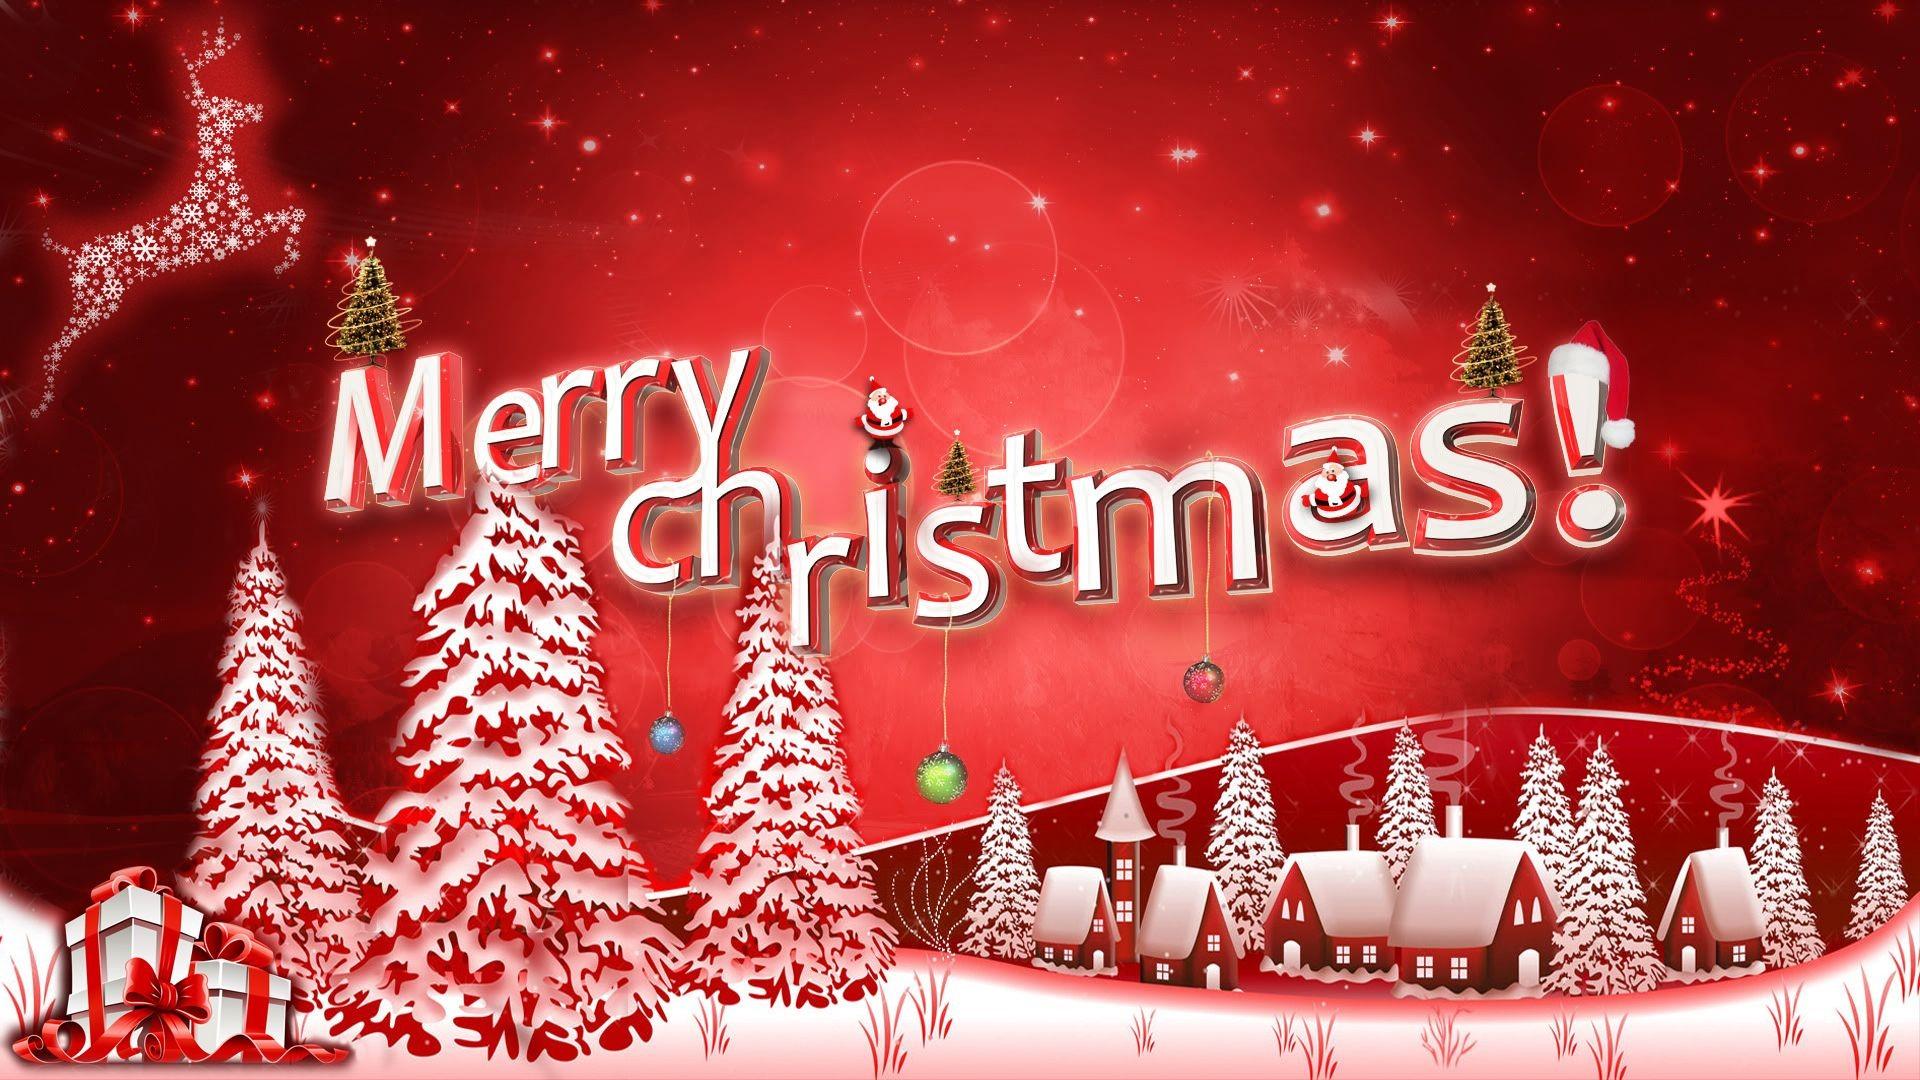 Merry Christmas 2017 greetings with beautiful Christmas tree HD wallpaper  free